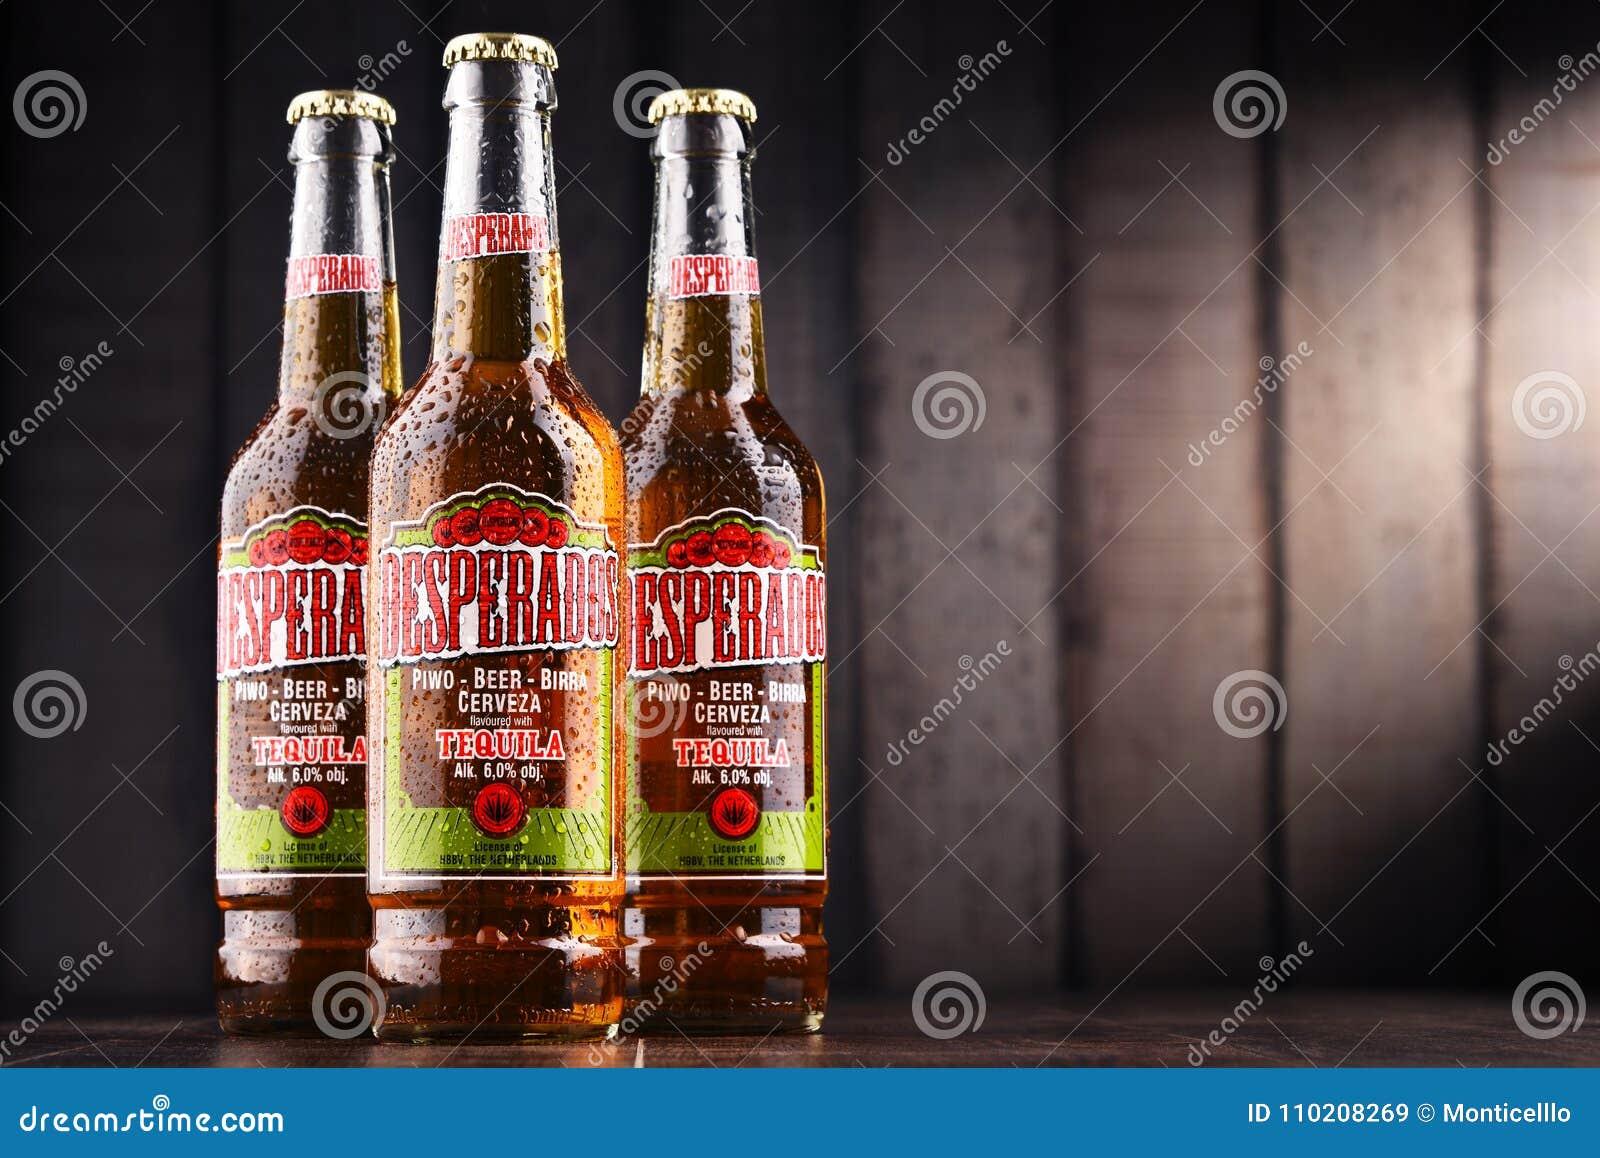 Three Bottles Of Desperados Beer Editorial Stock Image Image Of Beverage Hrvatska 110208269